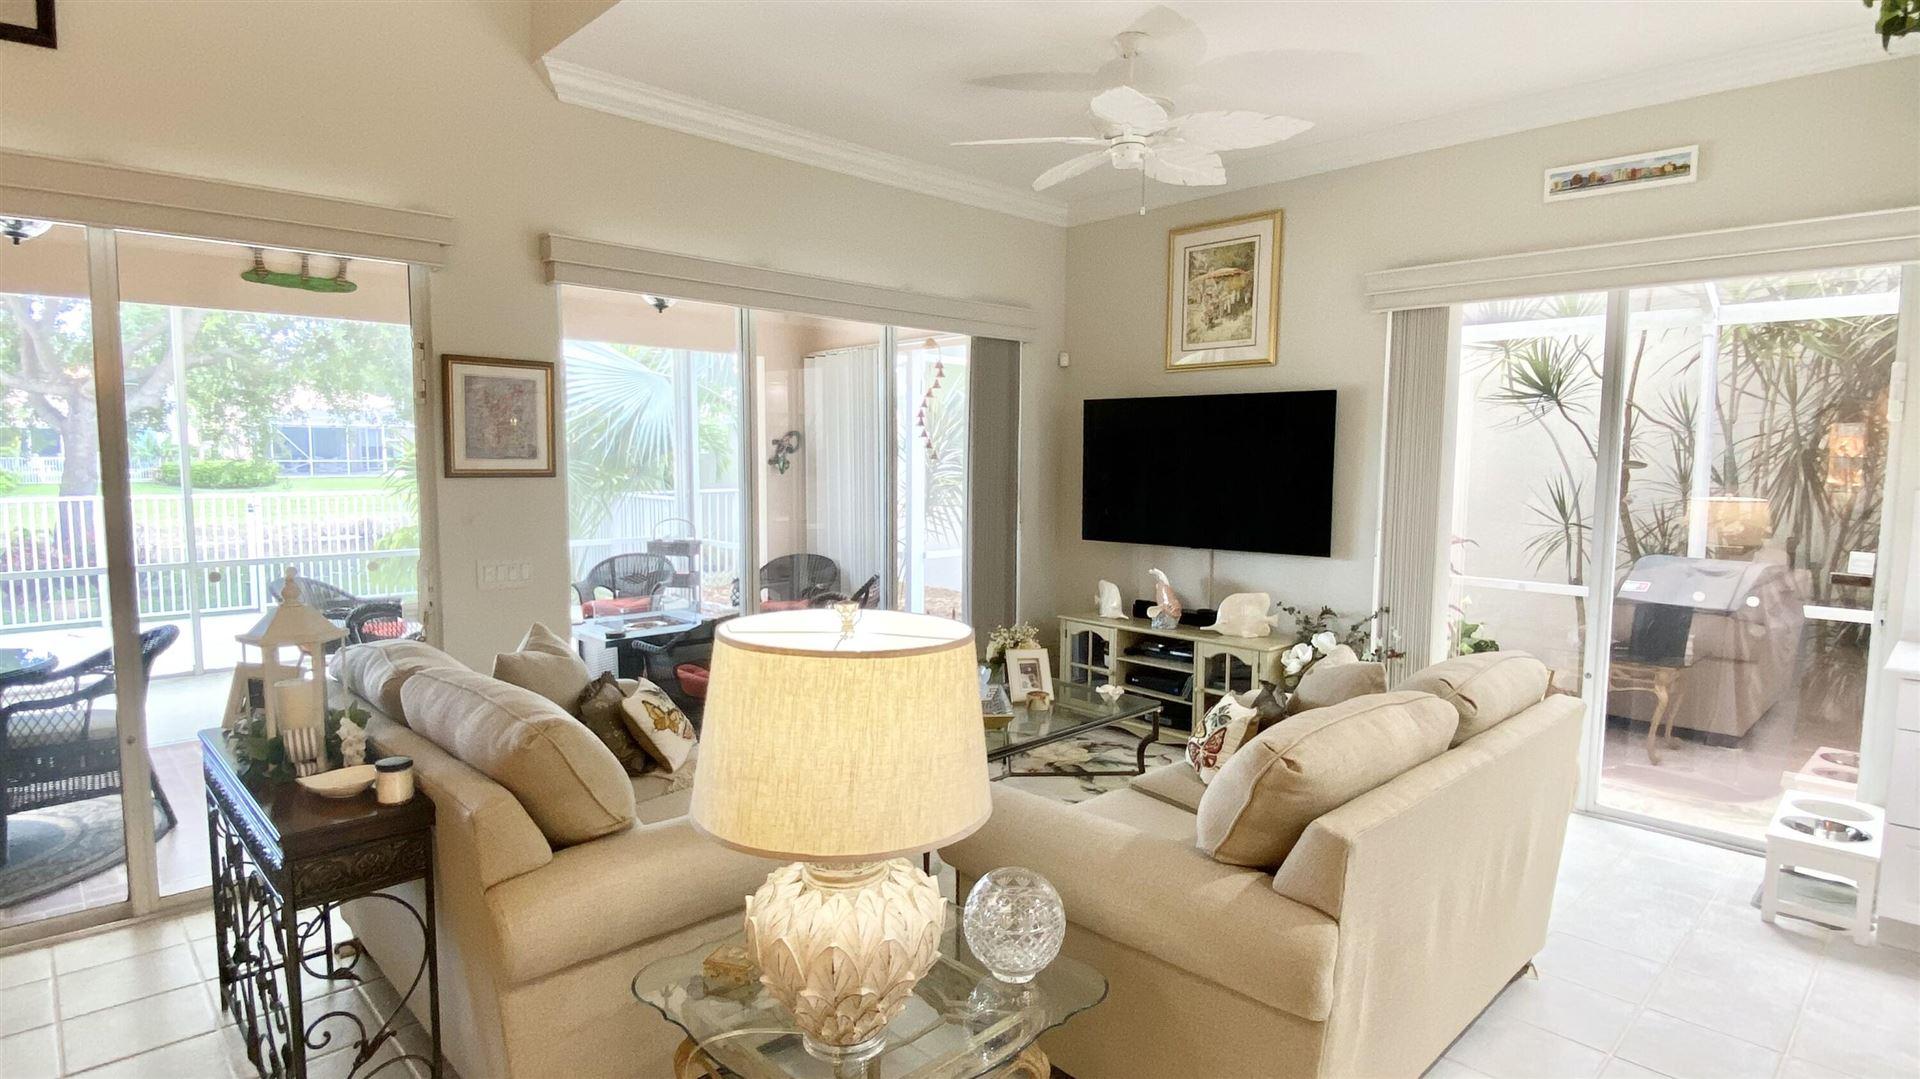 Photo of 2788 Kittbuck Way, West Palm Beach, FL 33411 (MLS # RX-10715479)